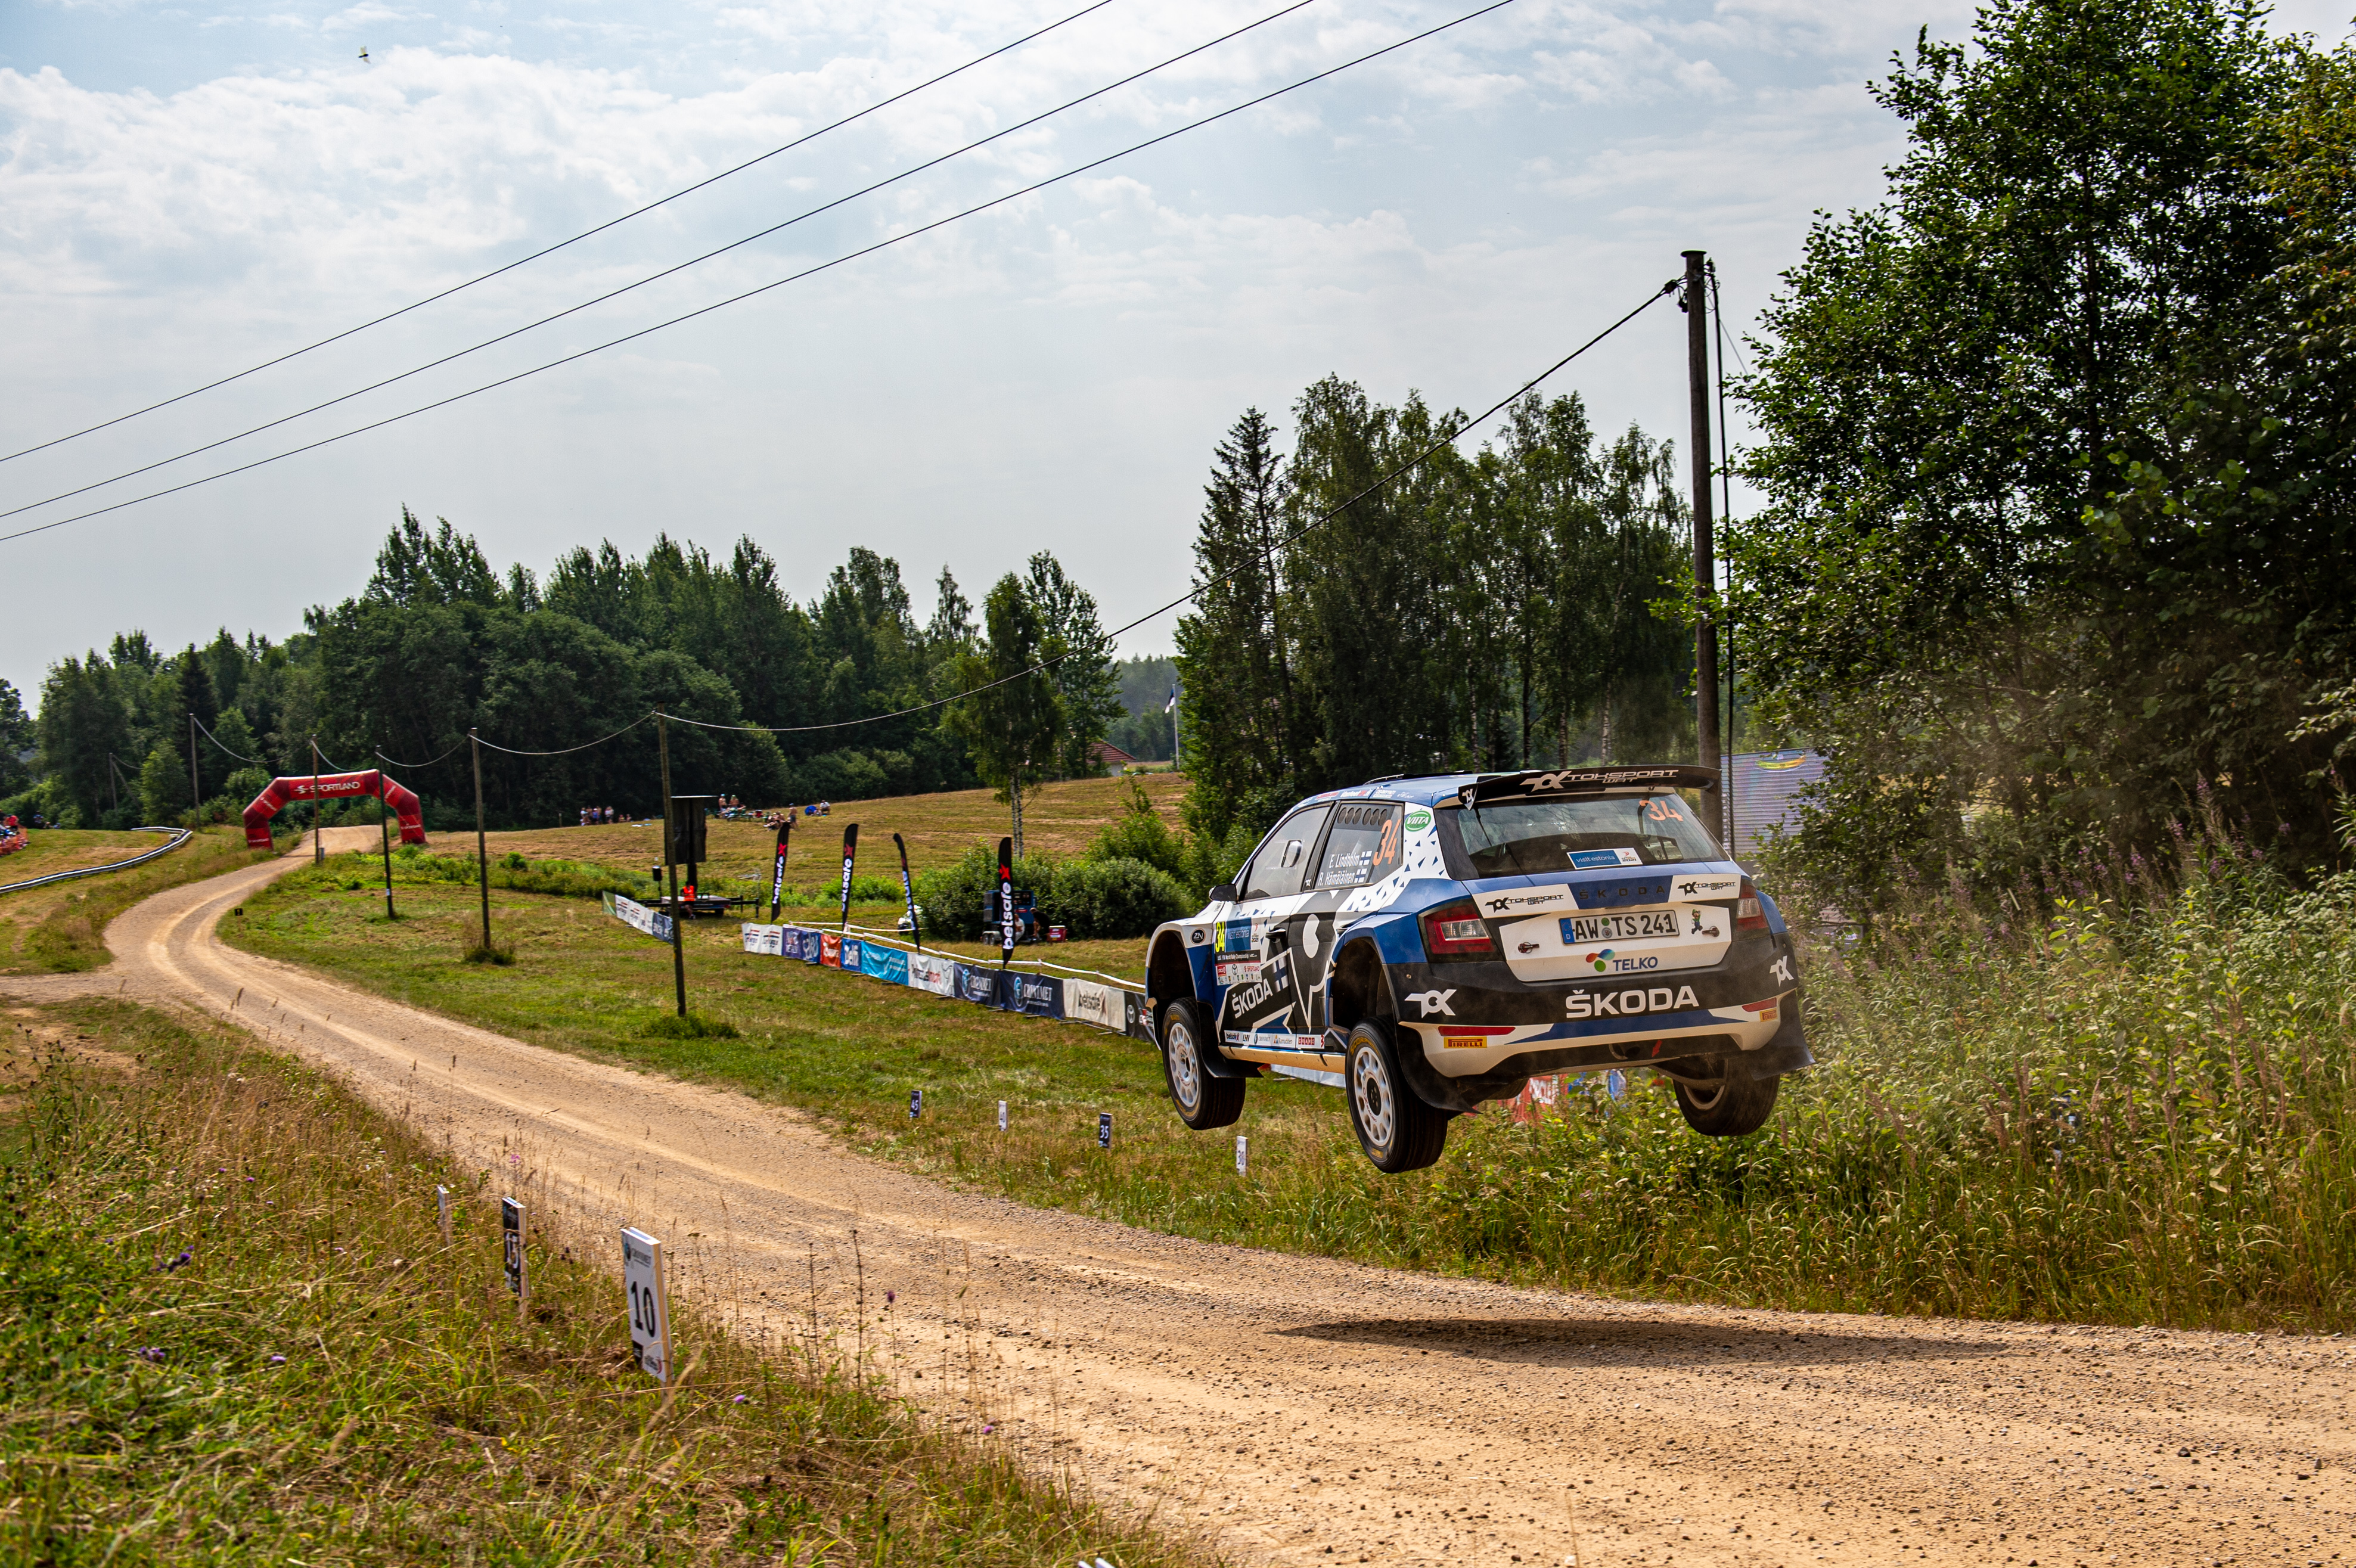 SKODA crews win WRC2 and WRC3 at Rally Estonia - Image 2